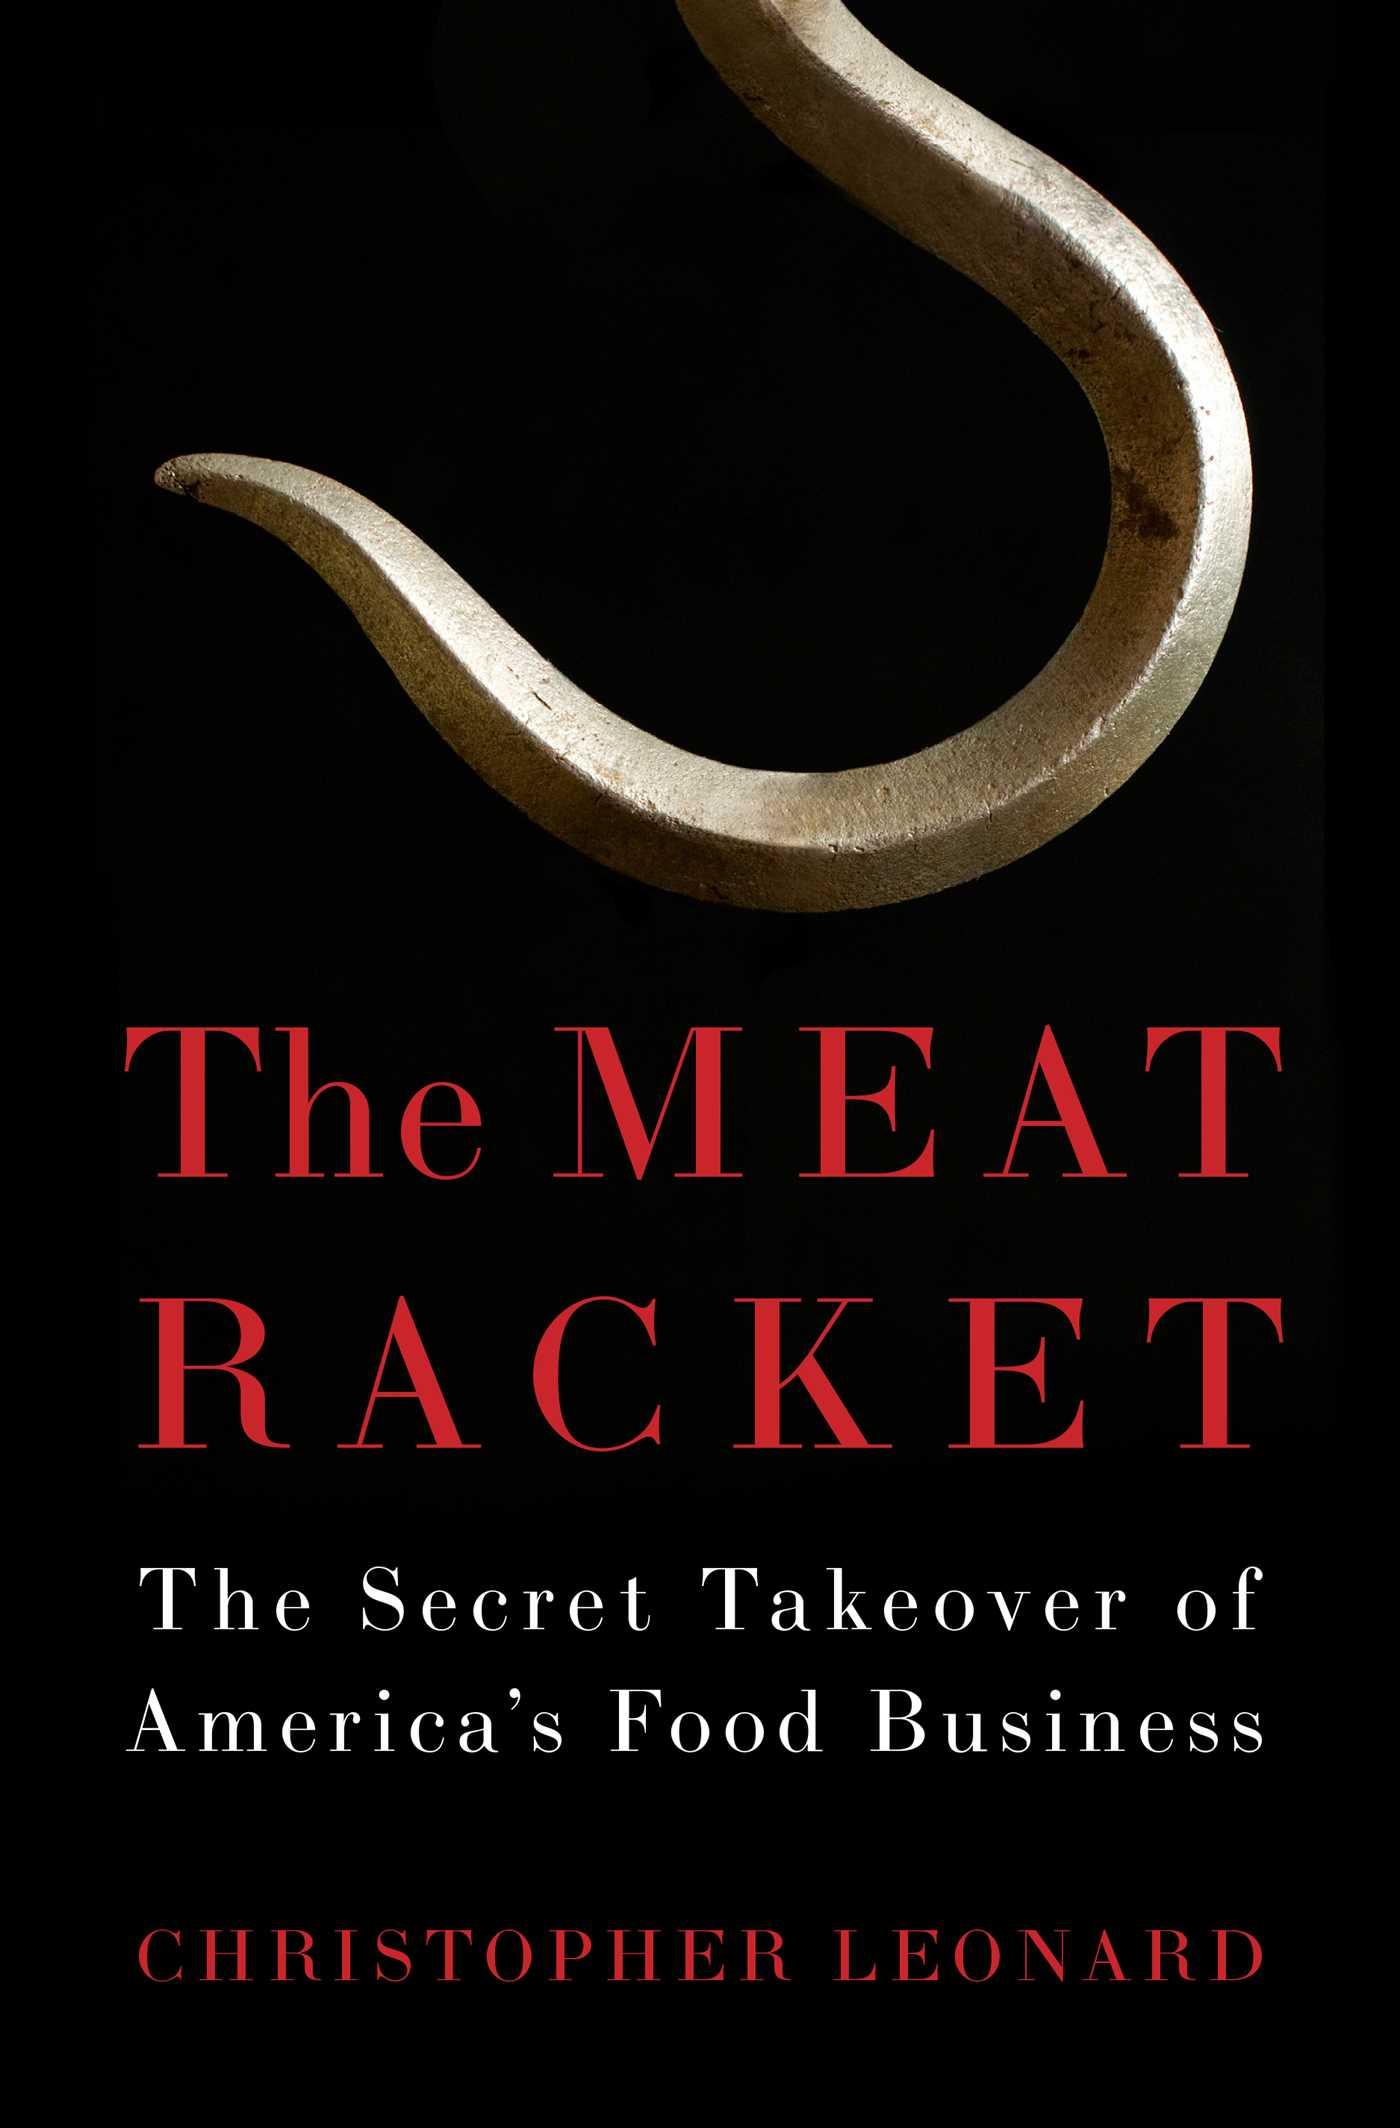 Meat racket 9781451645811 hr